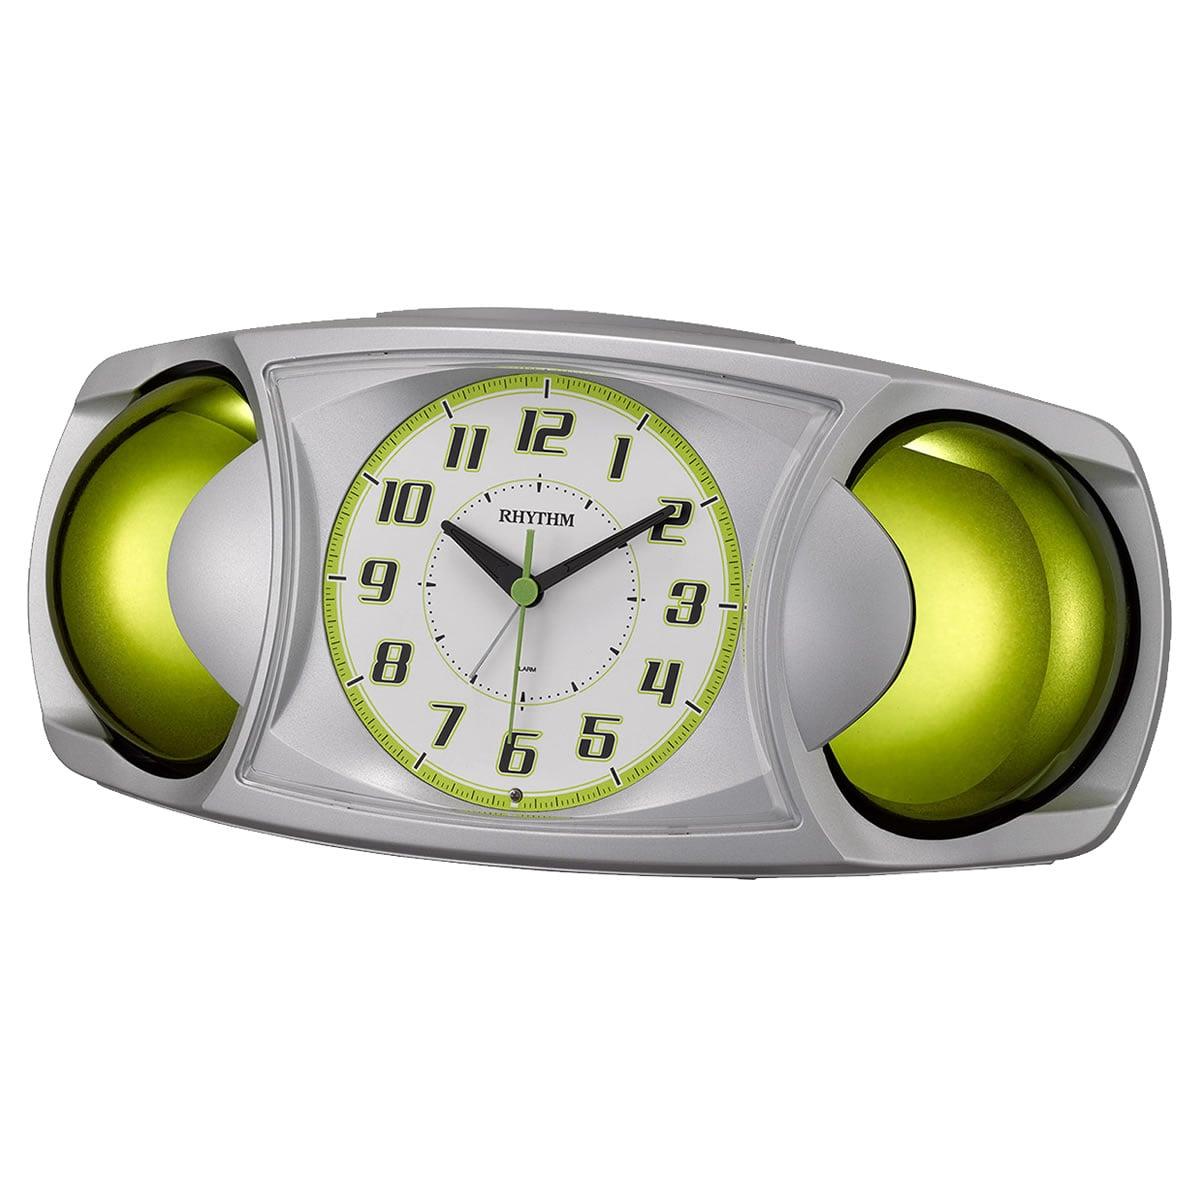 RHYTHM(リズム) 目覚まし時計 バトルMAX X シルバーメタリック 4RA482SR19